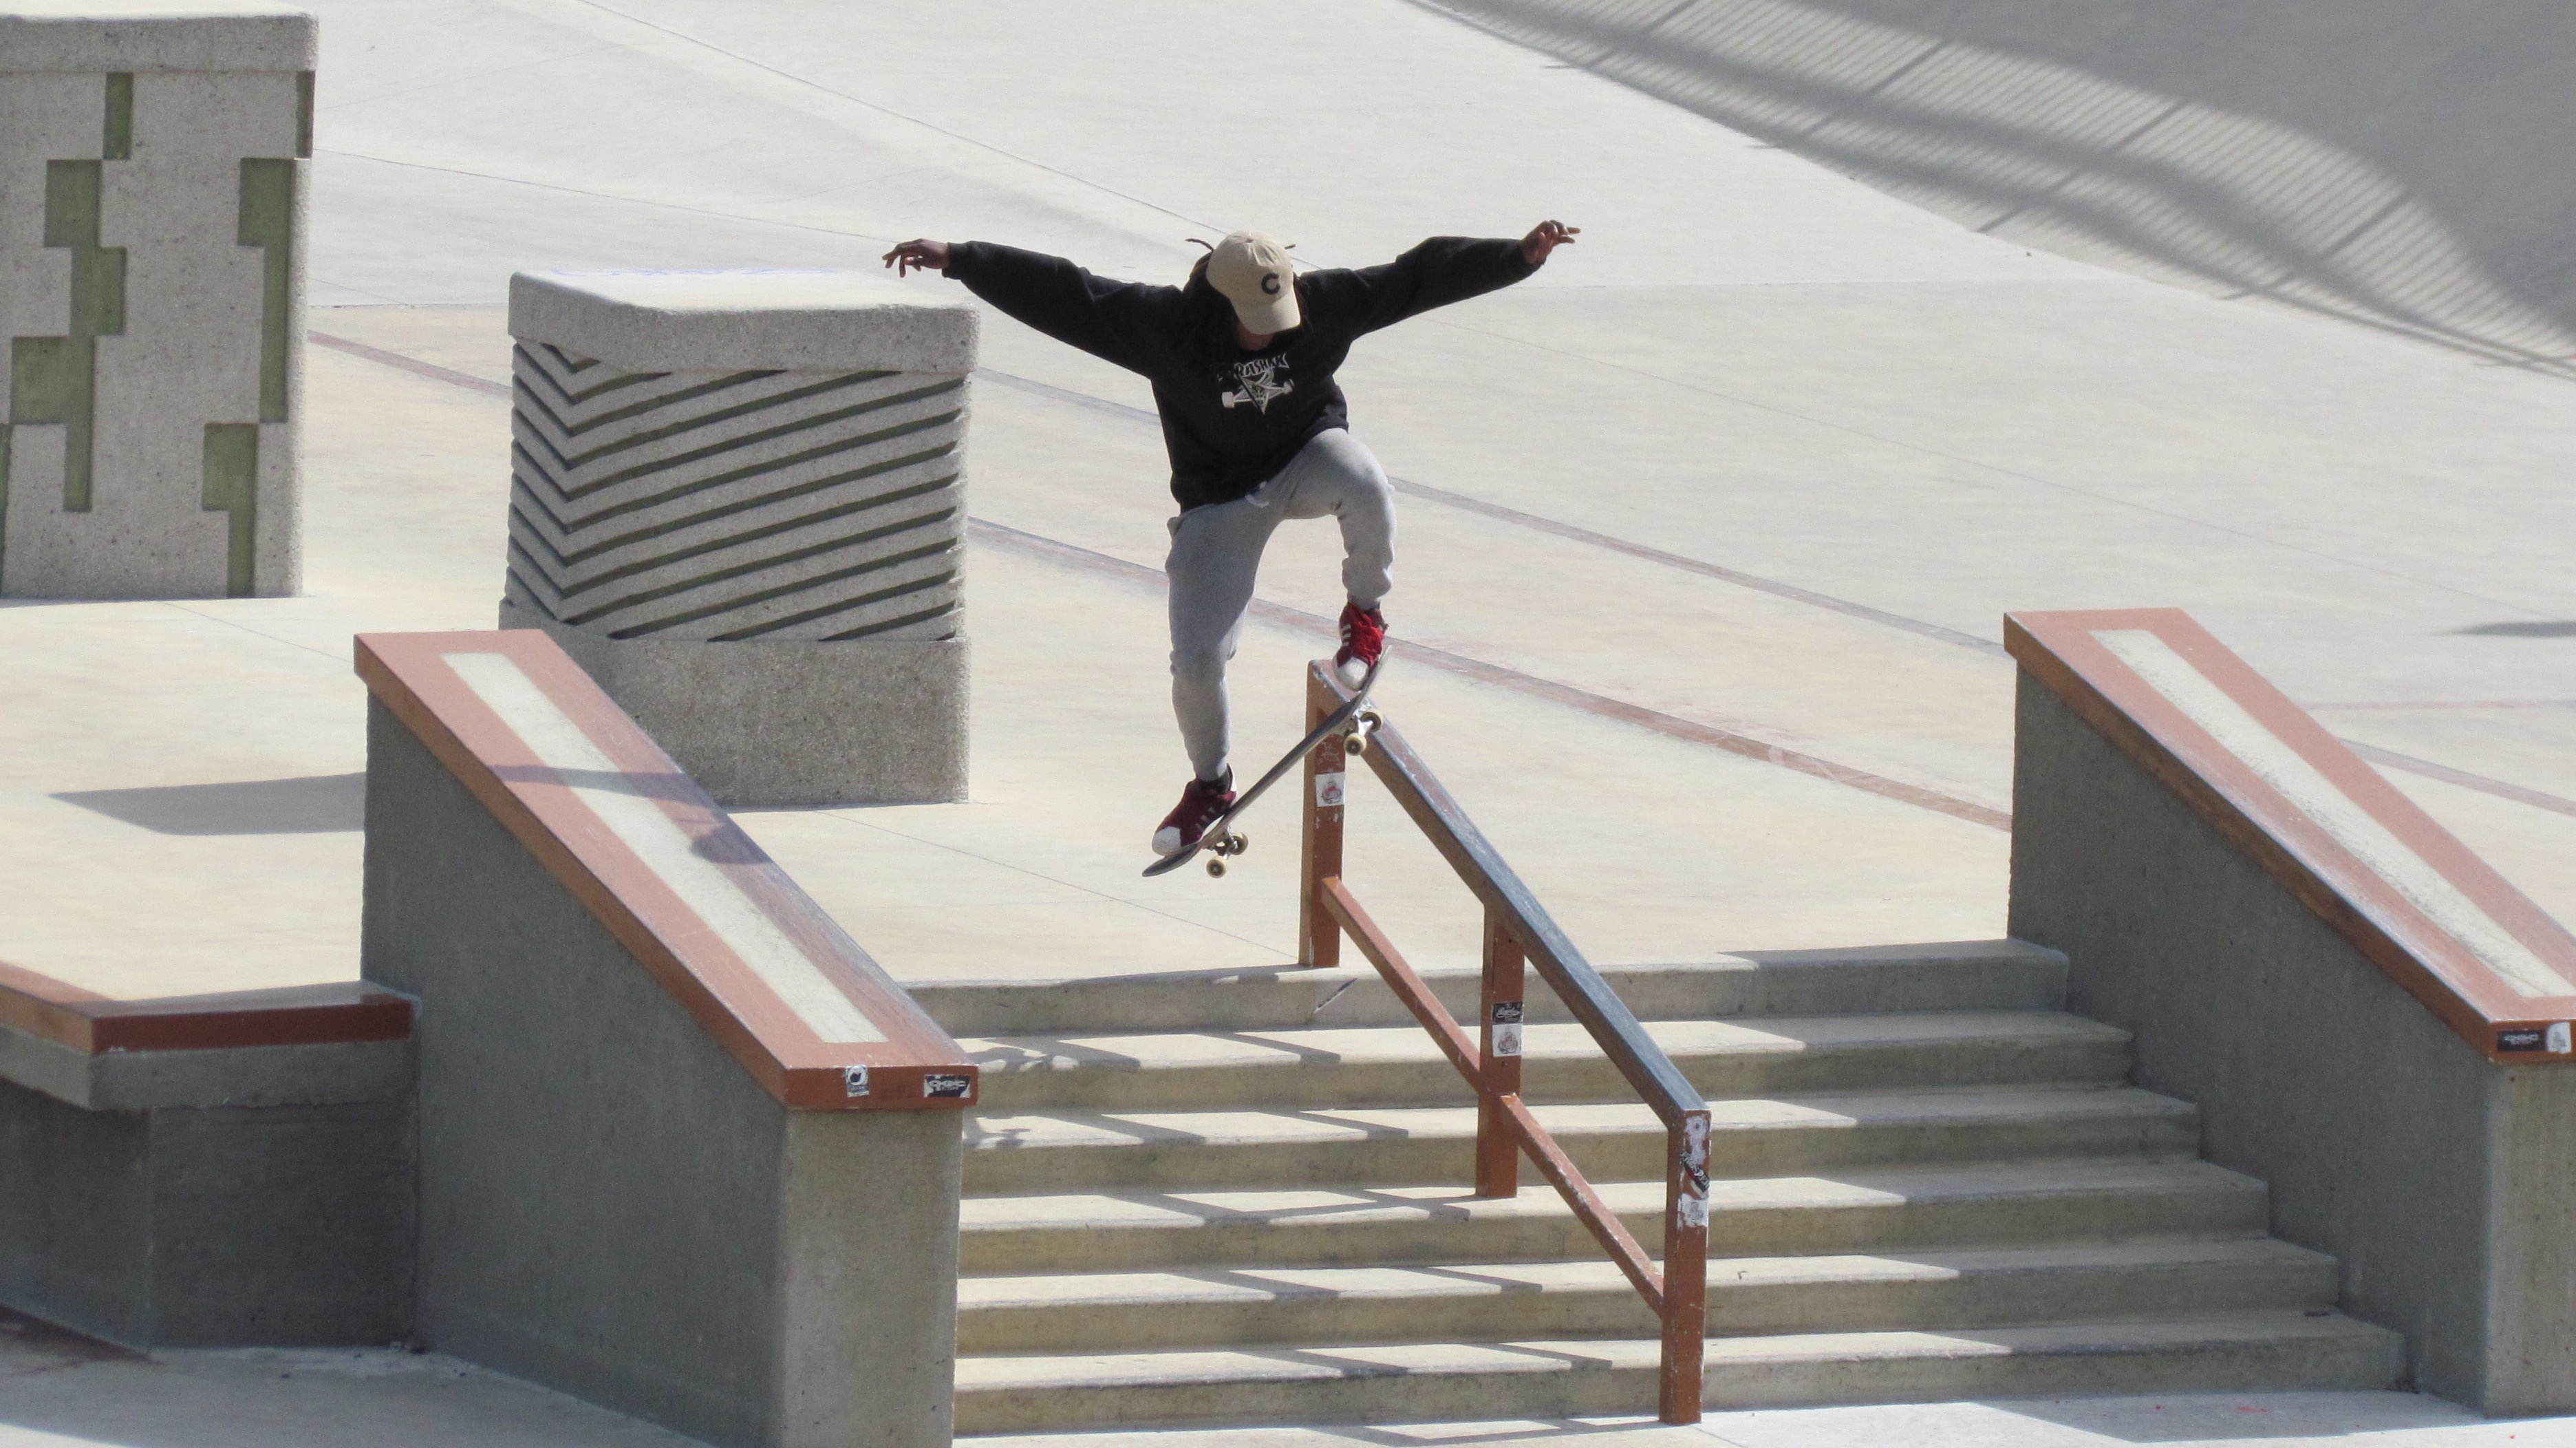 Grant Park Skate Park - 6